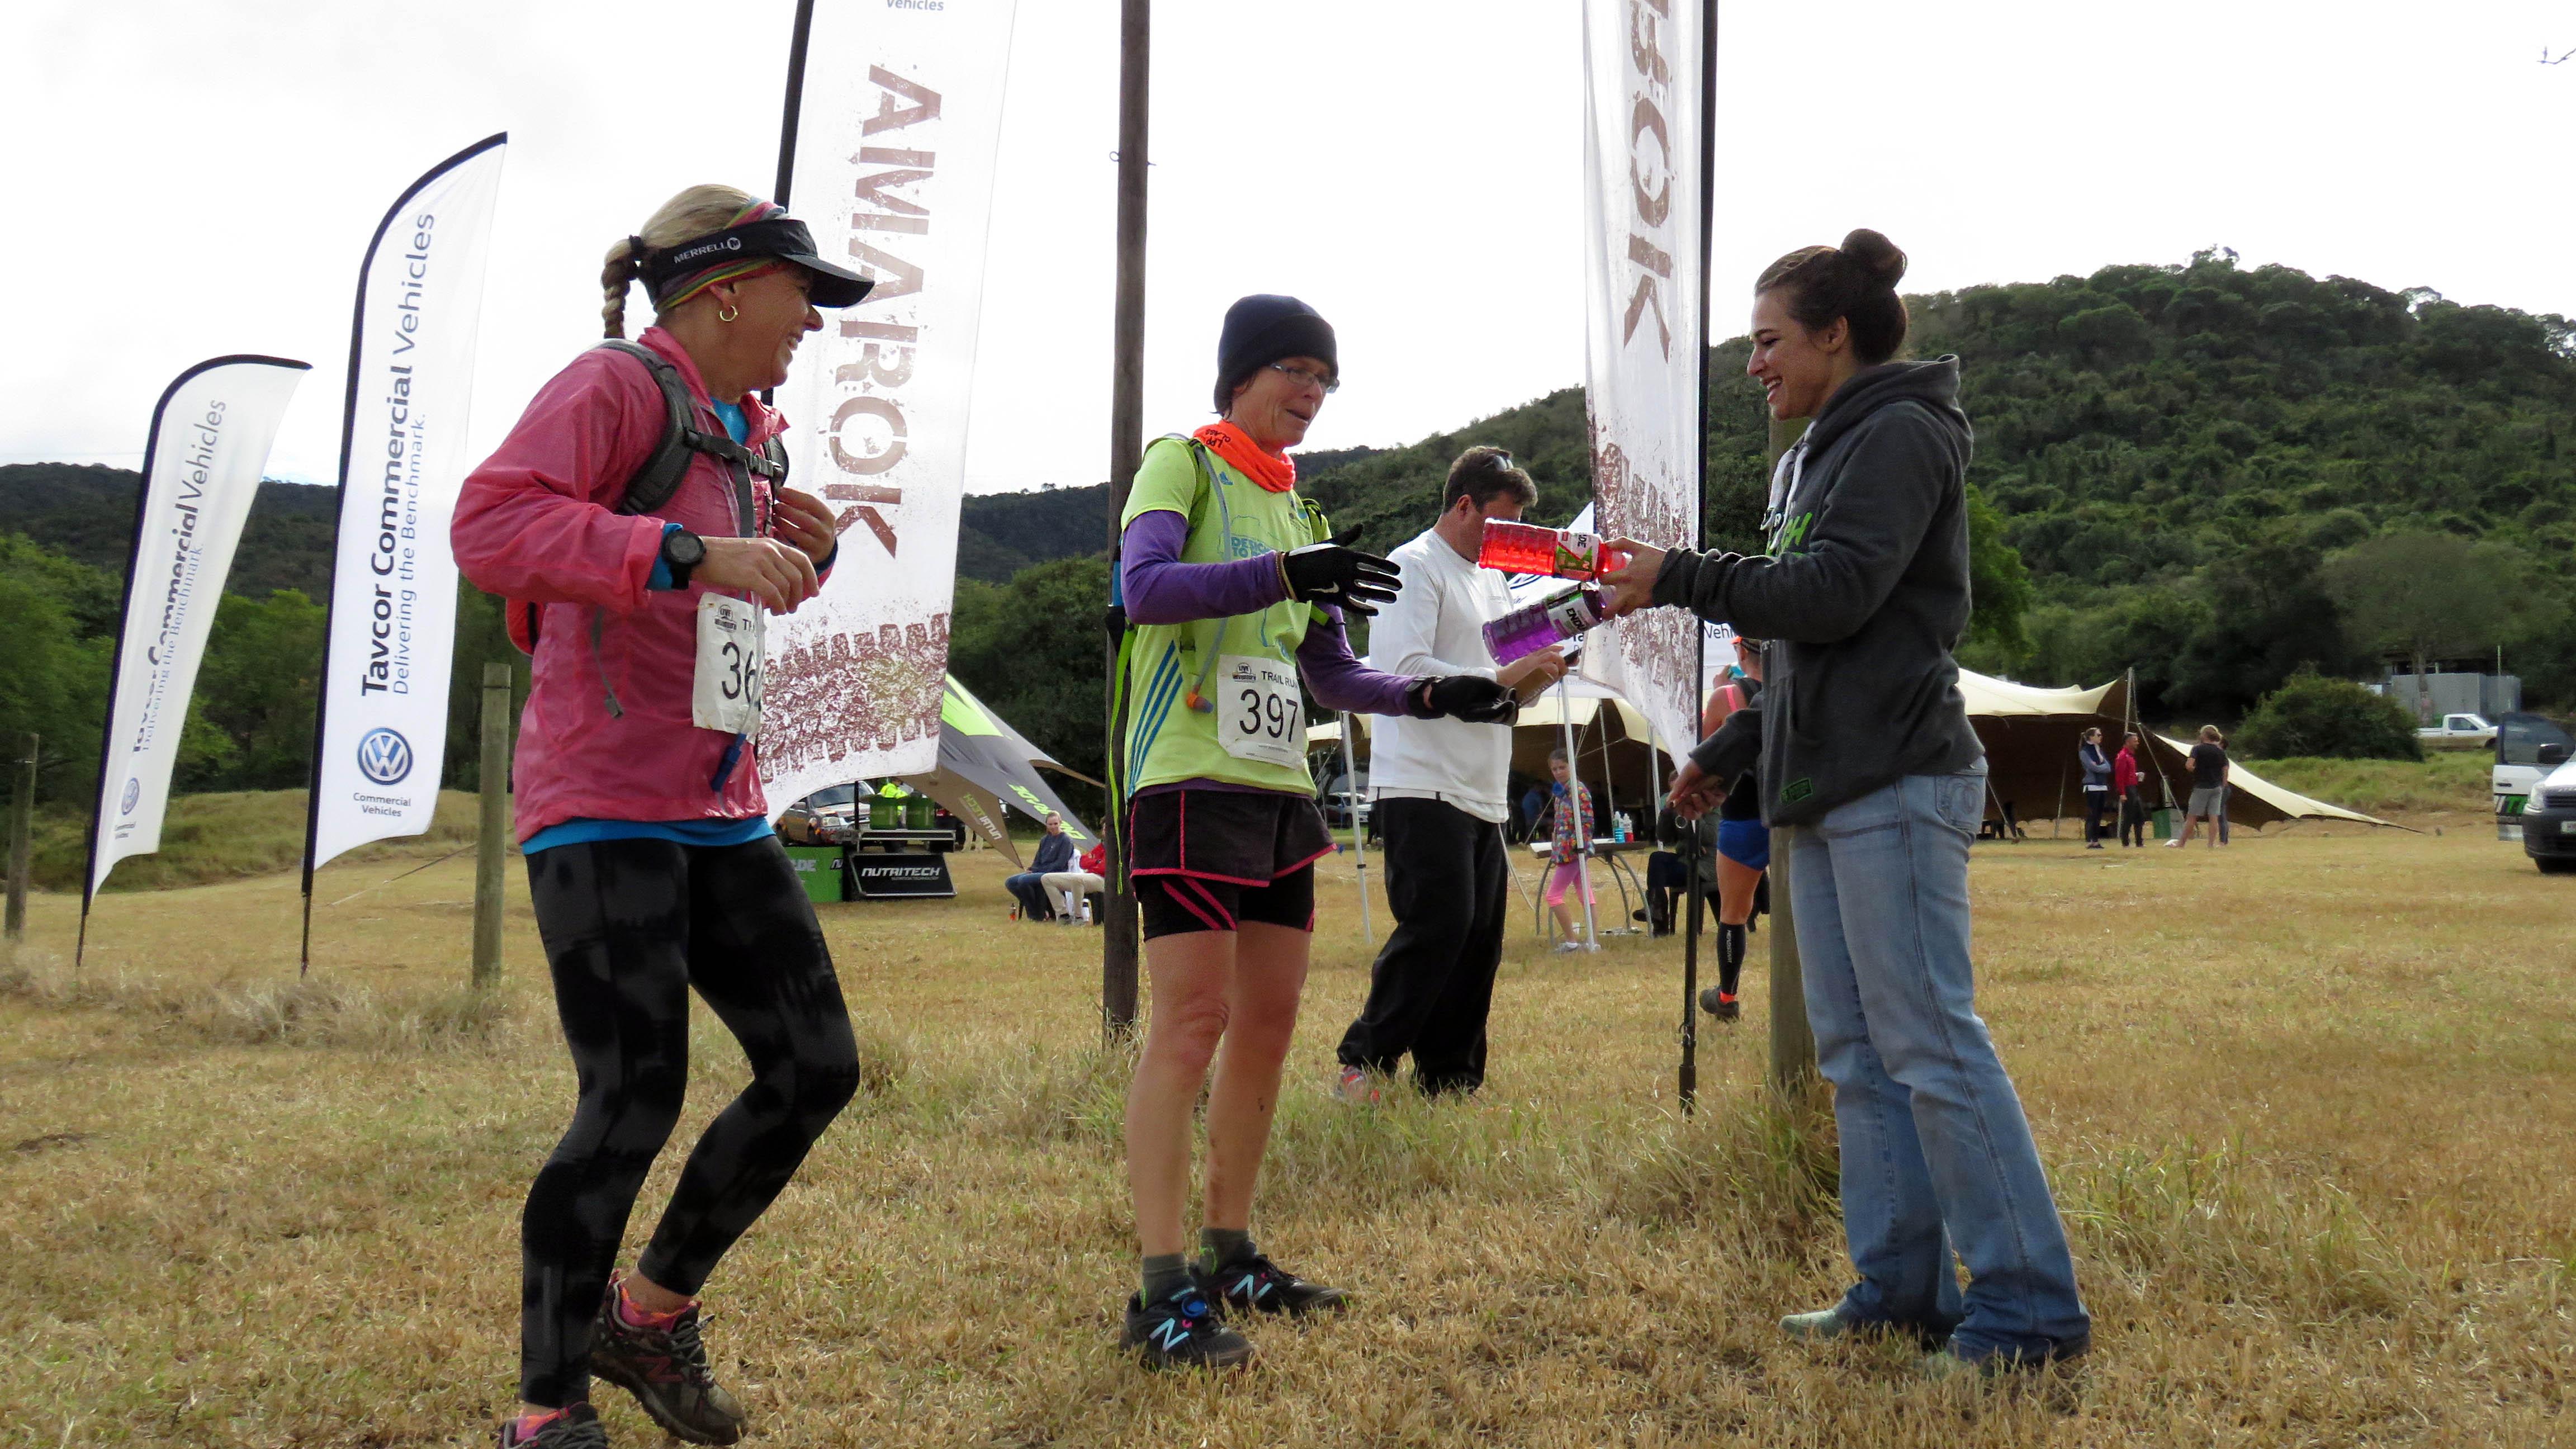 hayterdale trailrun 2018-08-05  (128)